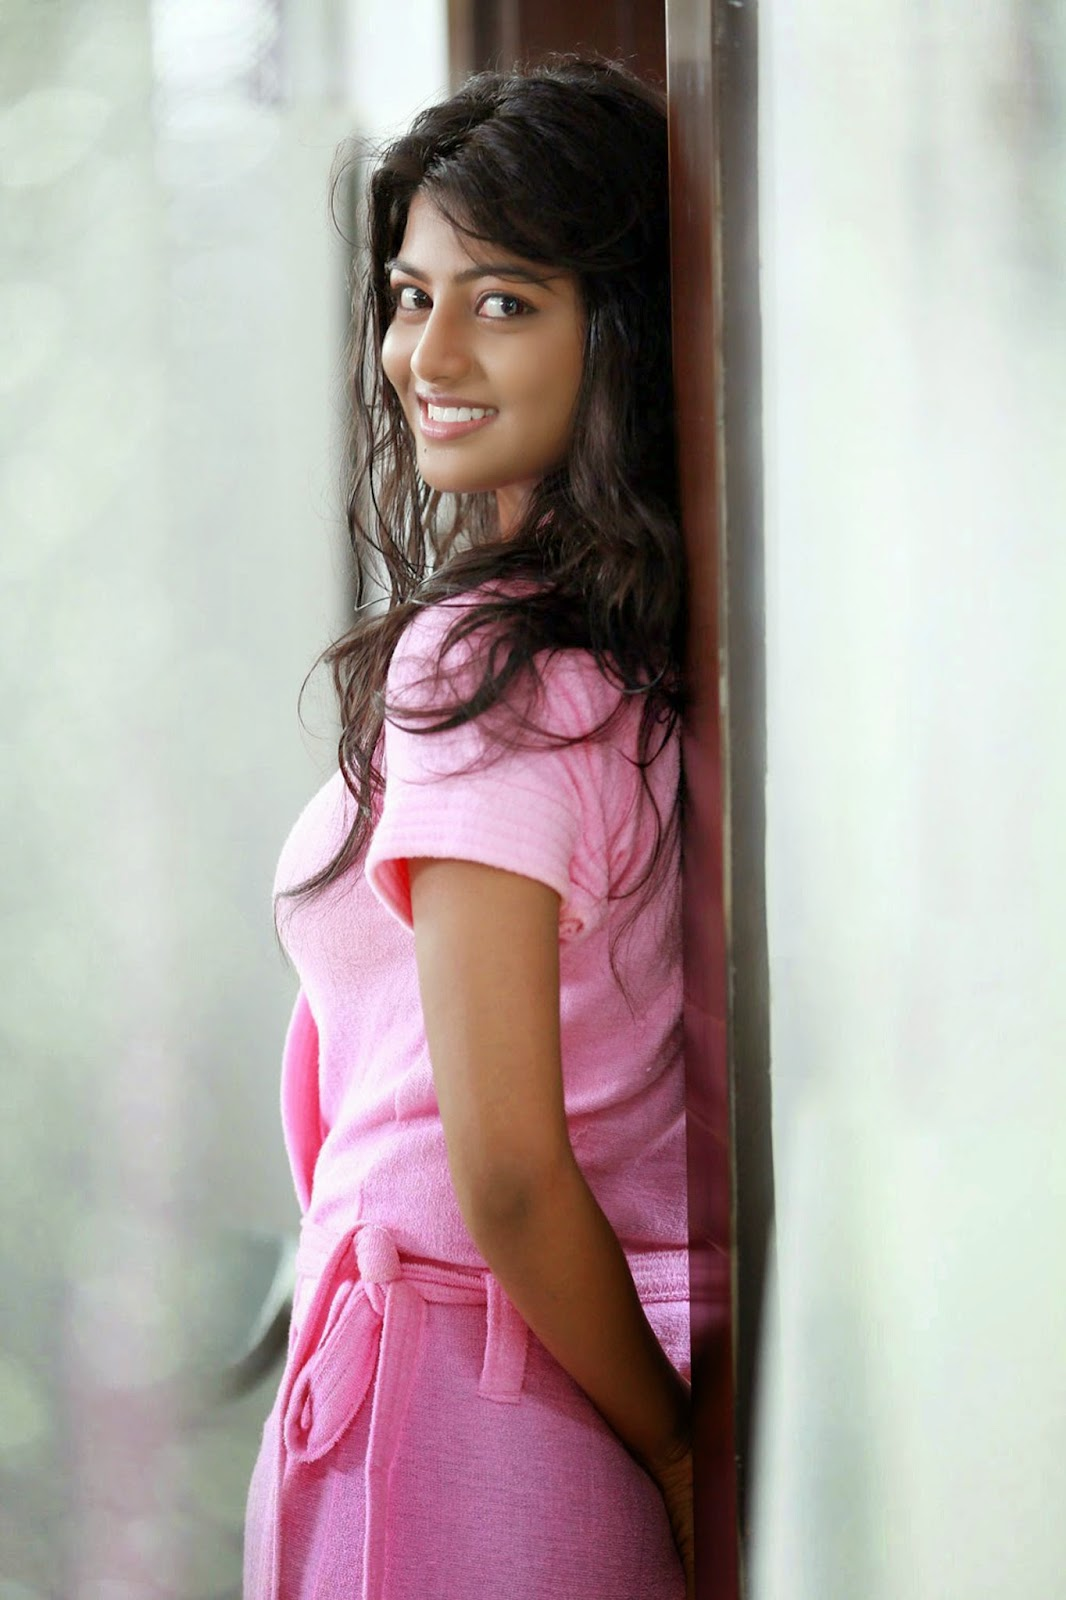 rakshitha hd wallpapers download - hot actress of south - actress host